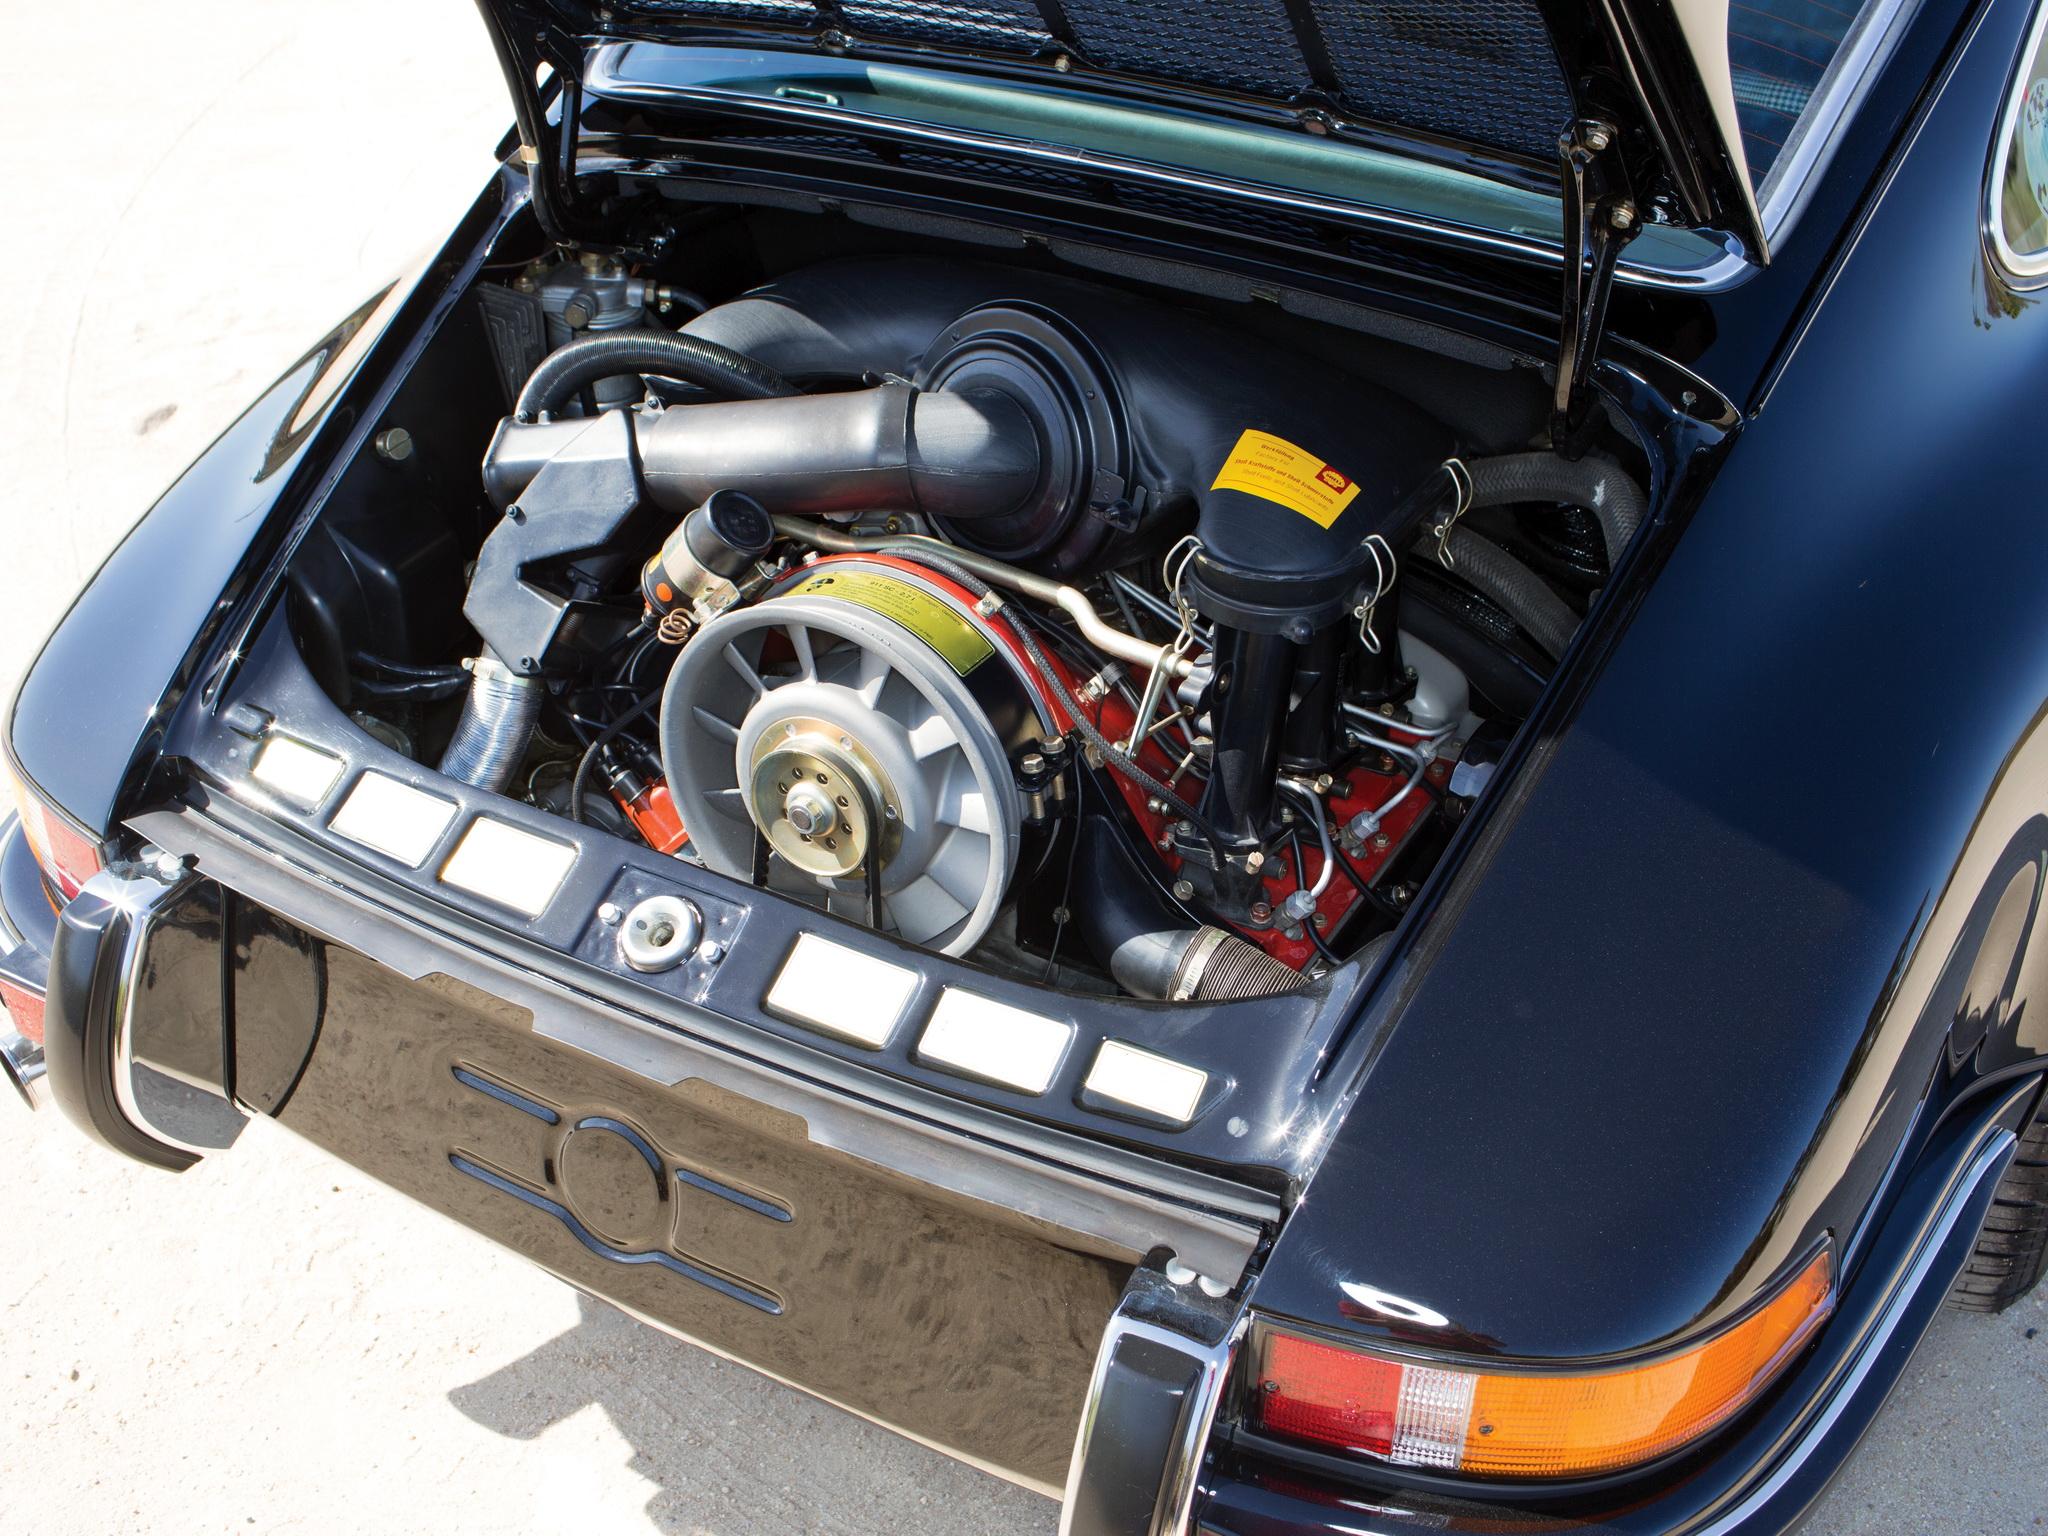 1972 Porsche 911 Carrera RS 2_7 Touring UK-spec 911 engine w ...